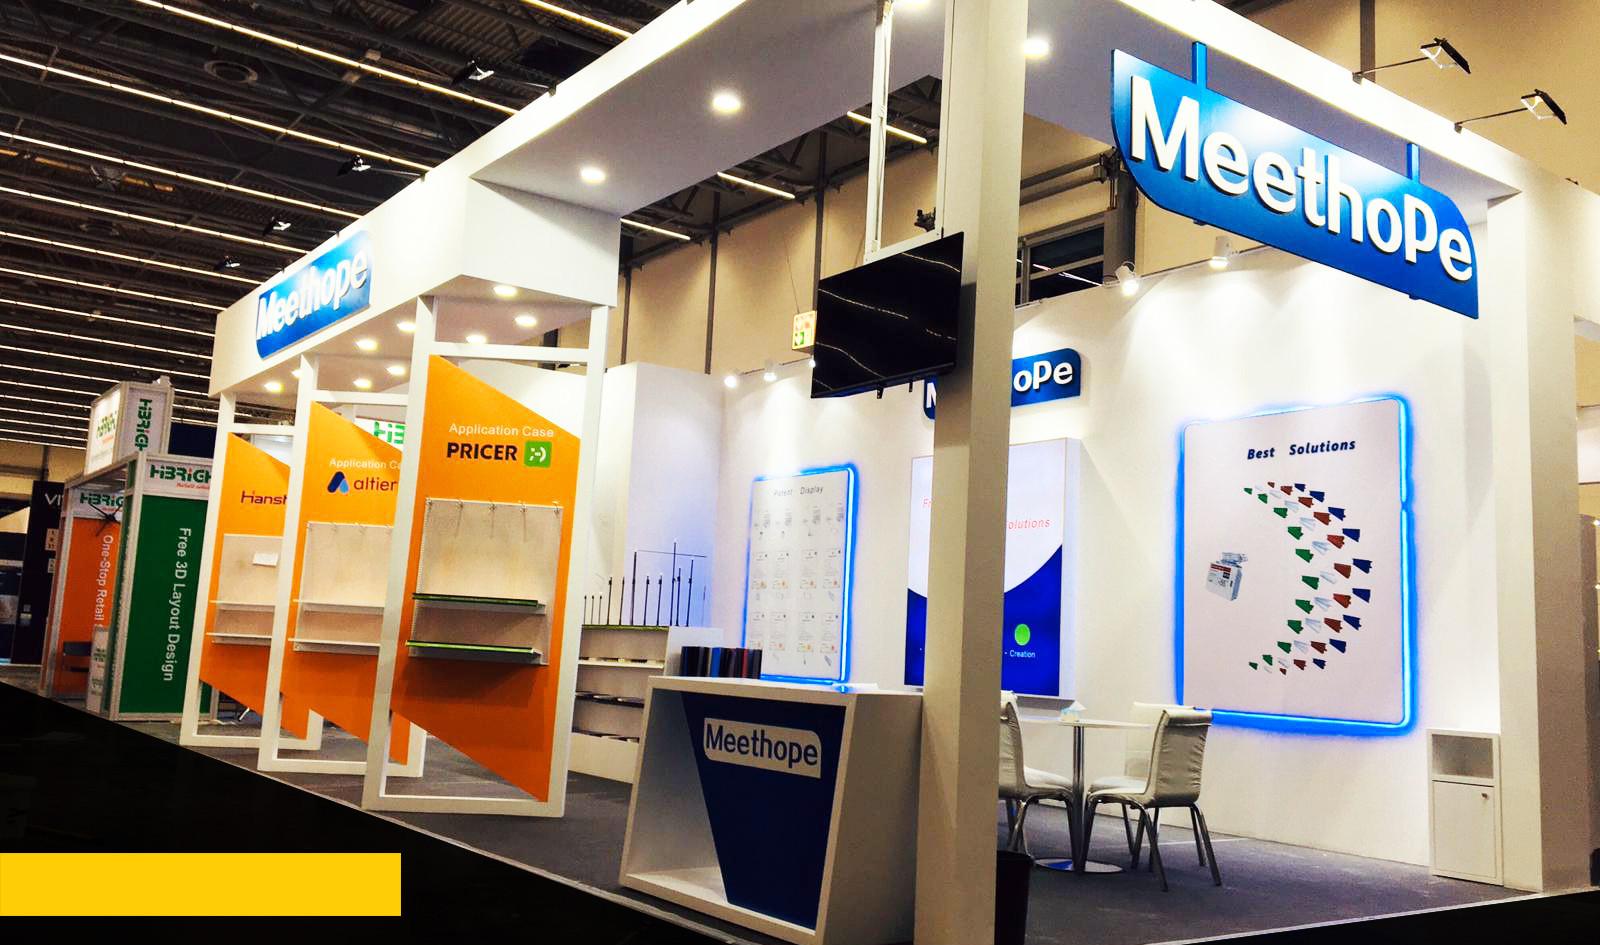 Meethope company.